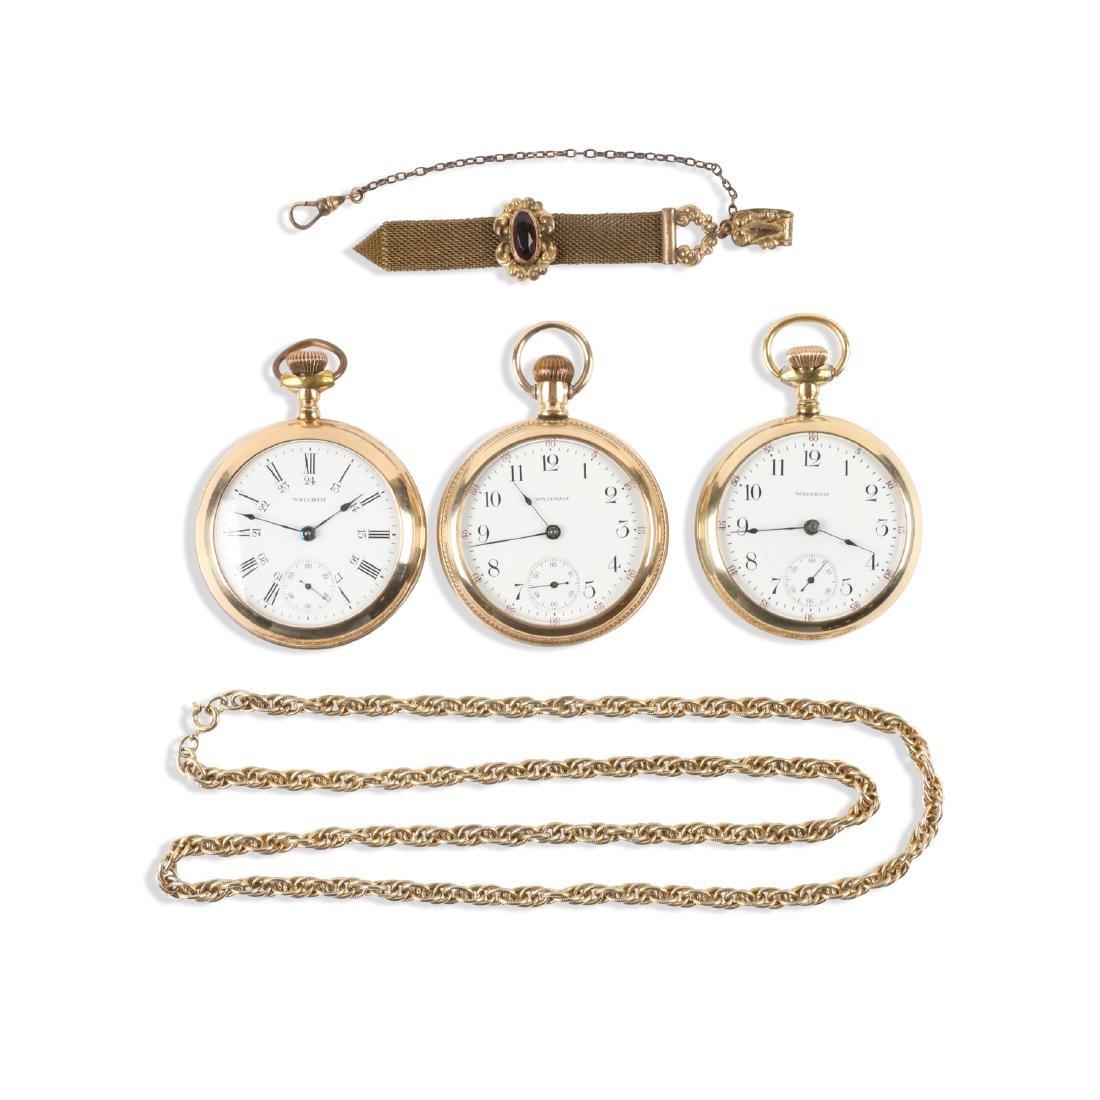 Waltham, 1883 Model Pocket Watches